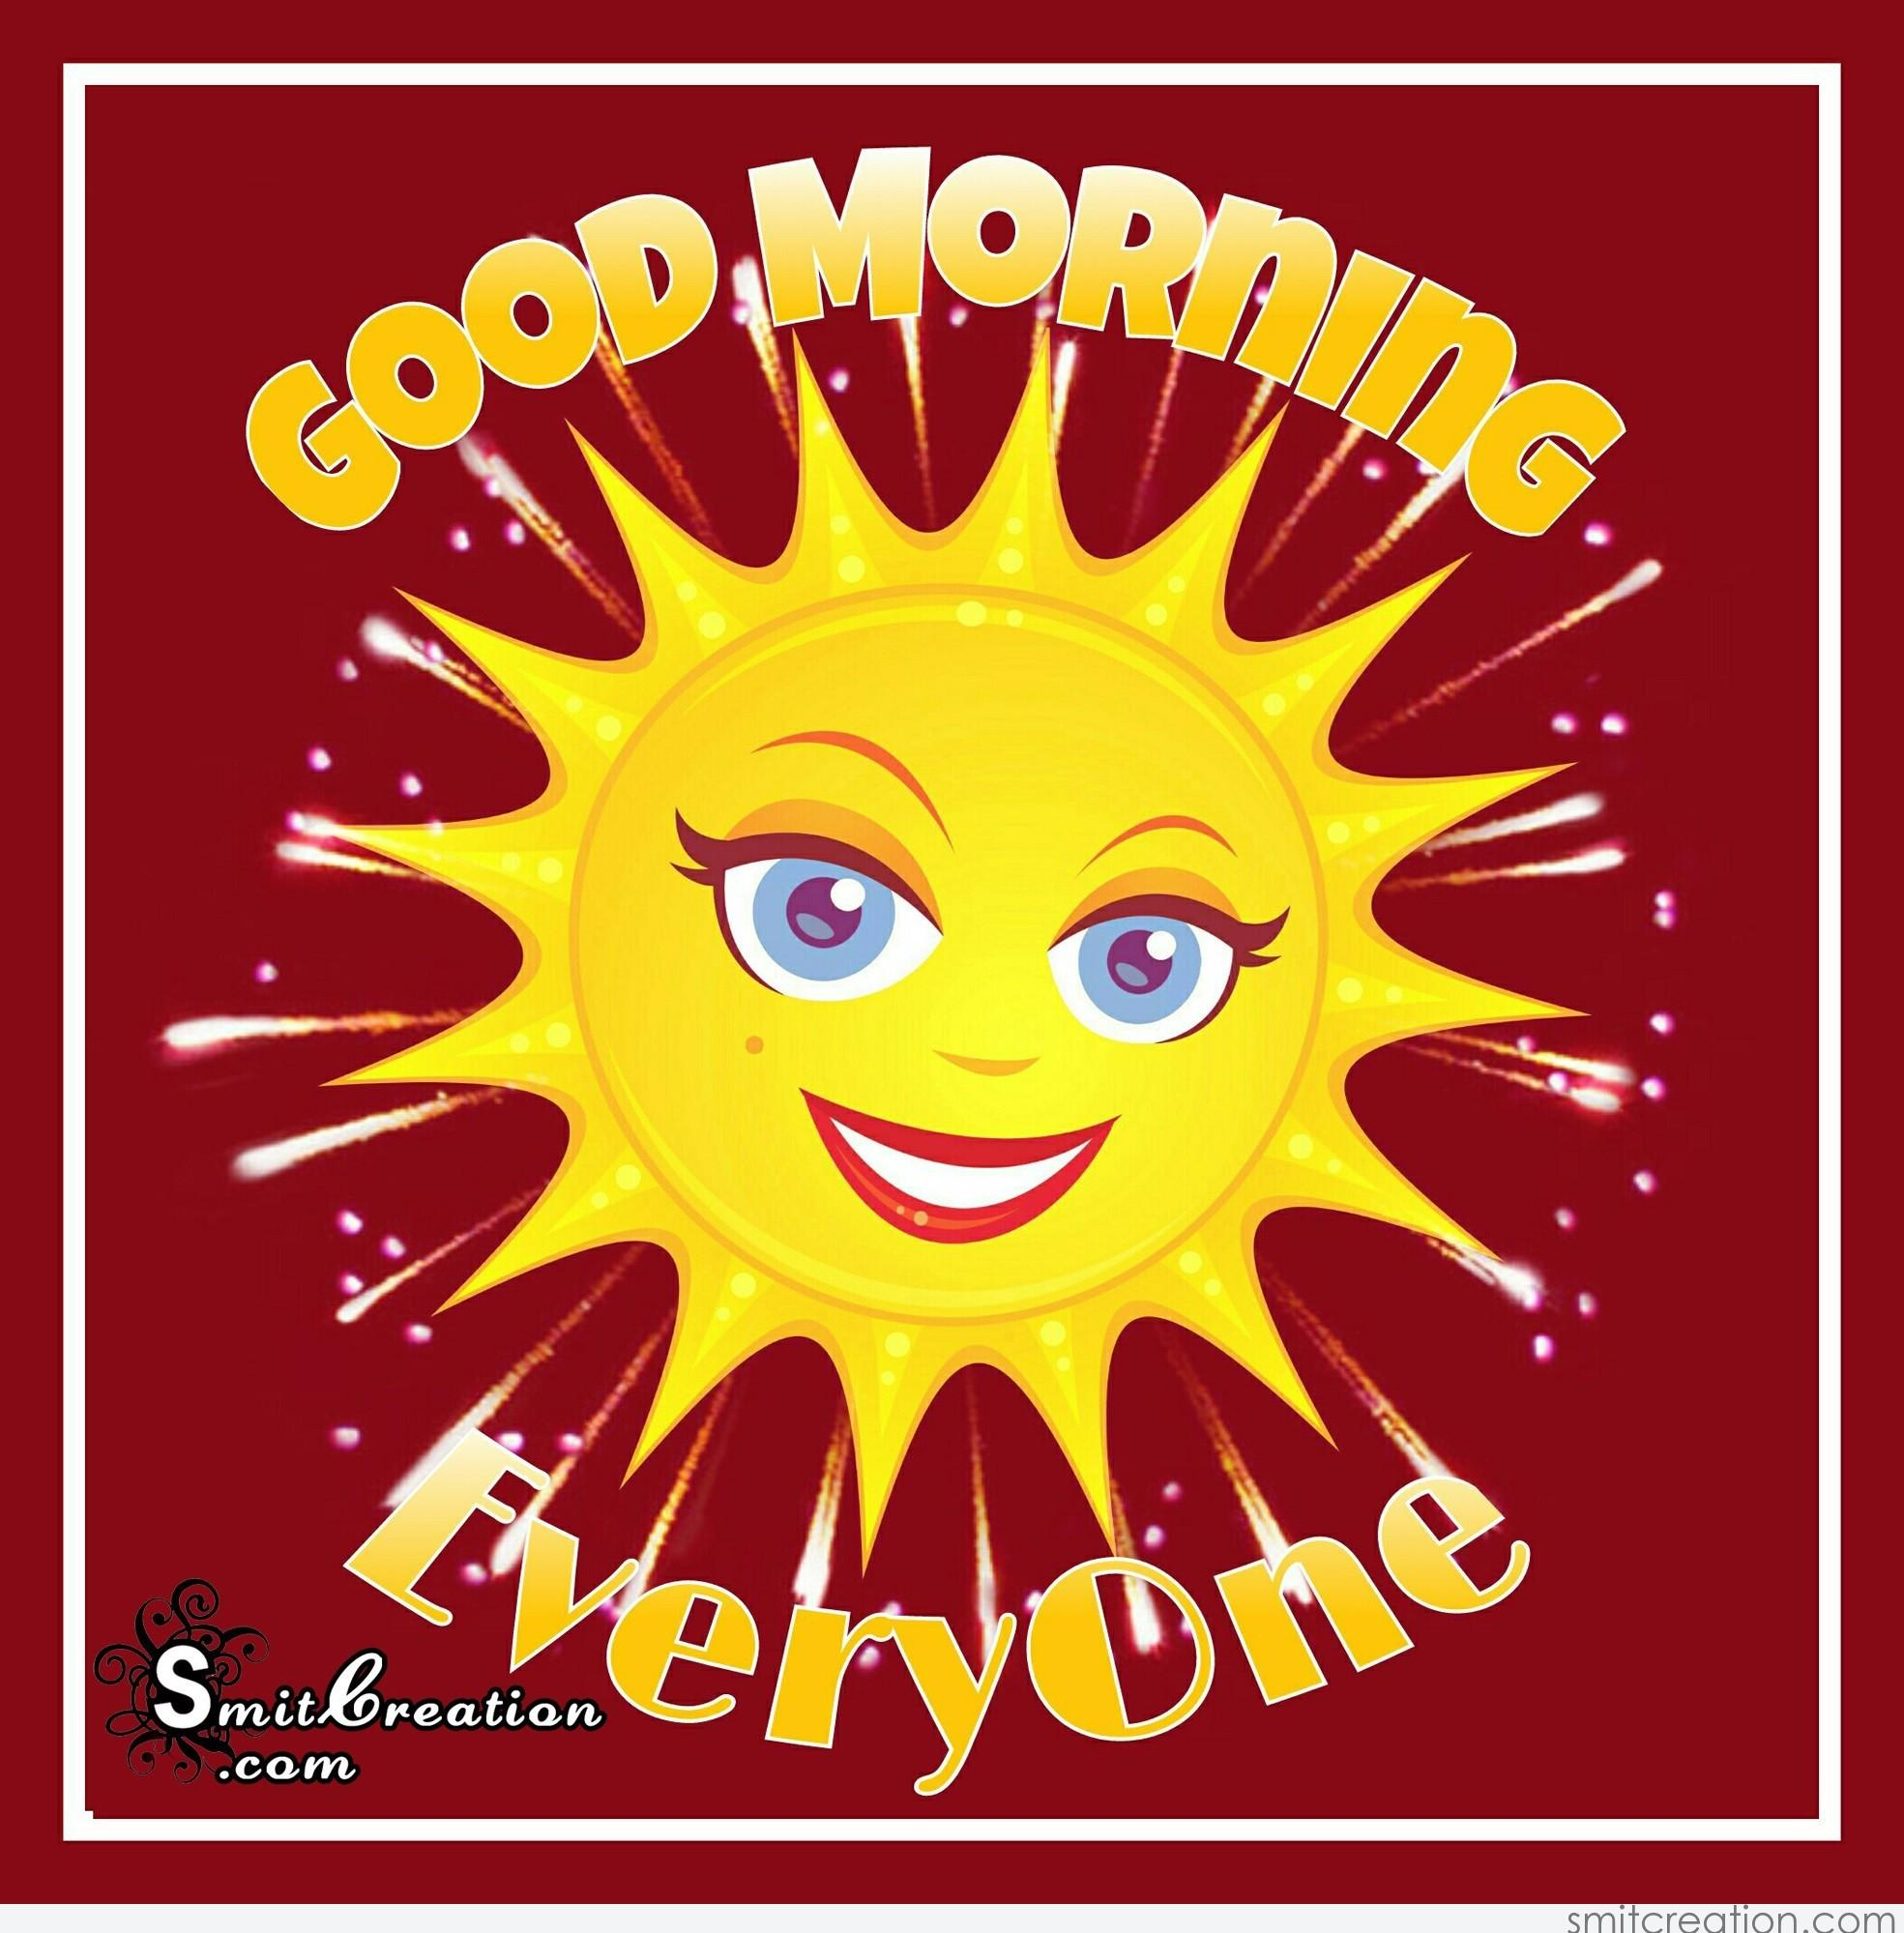 Good Morning Everyone In Cebuano : Good morning everyone smitcreation